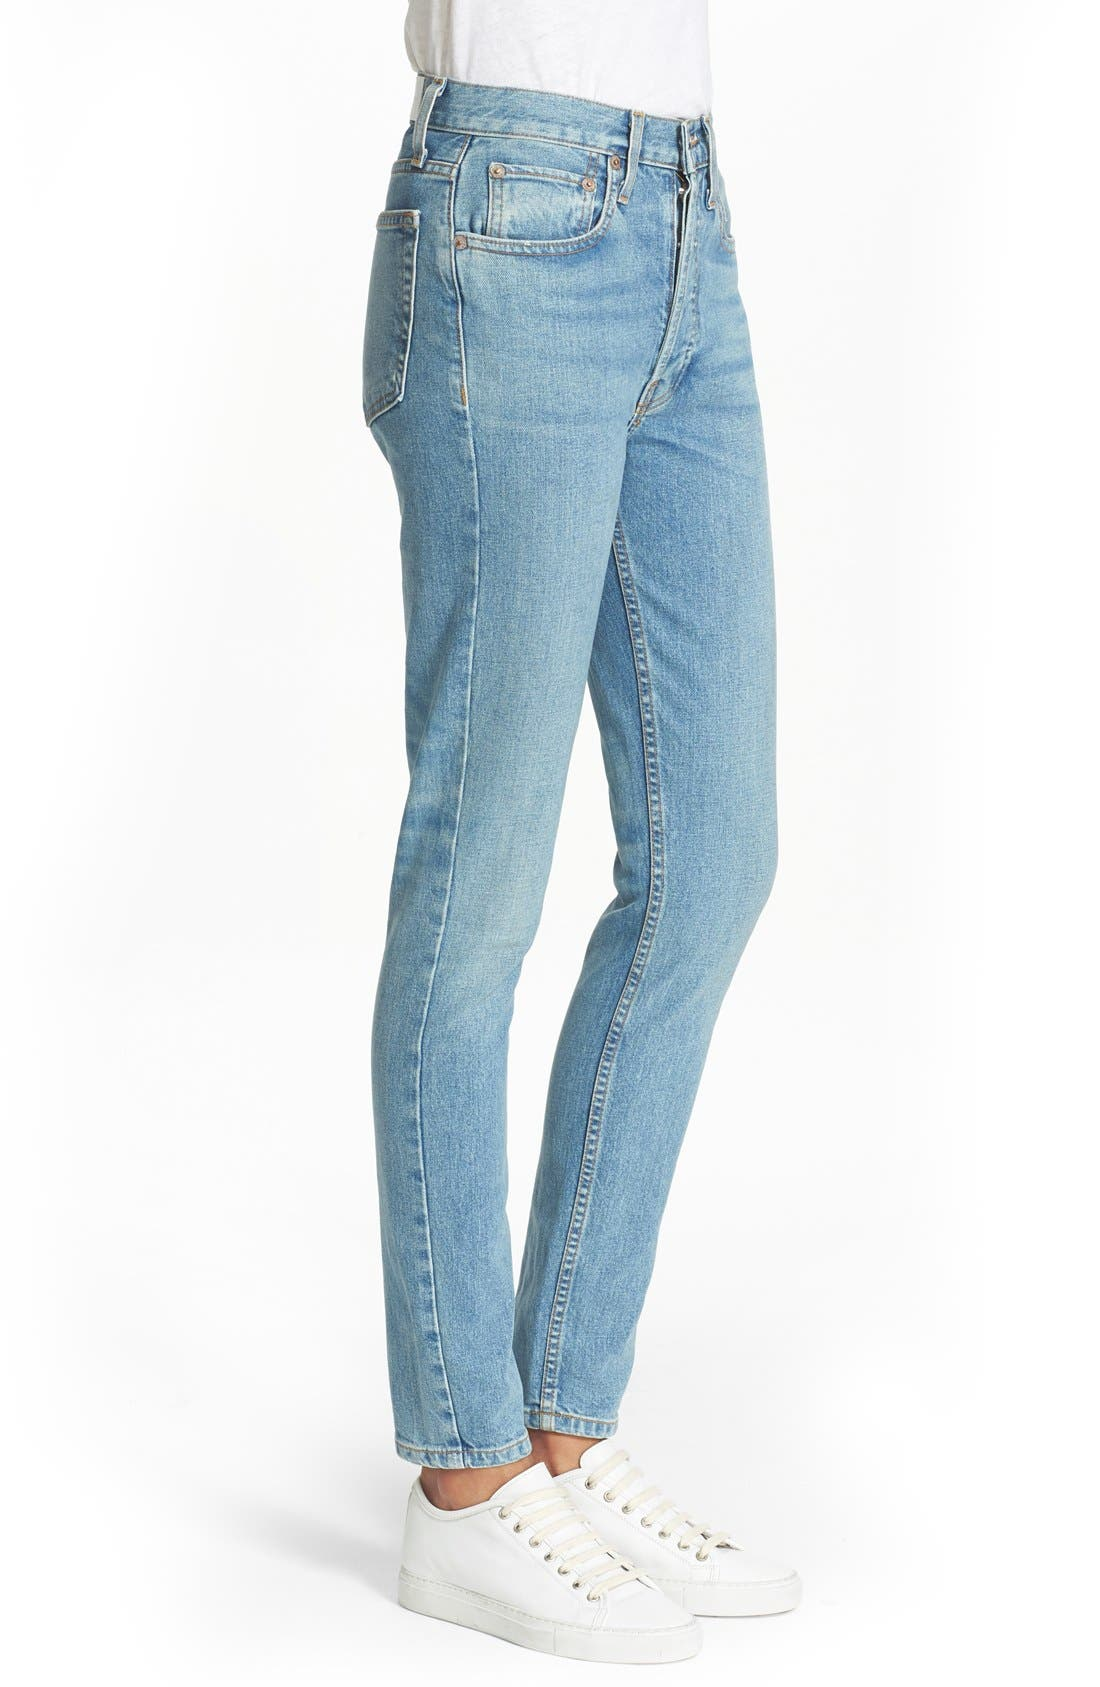 Originals High Rise Stretch Jeans,                             Alternate thumbnail 2, color,                             400